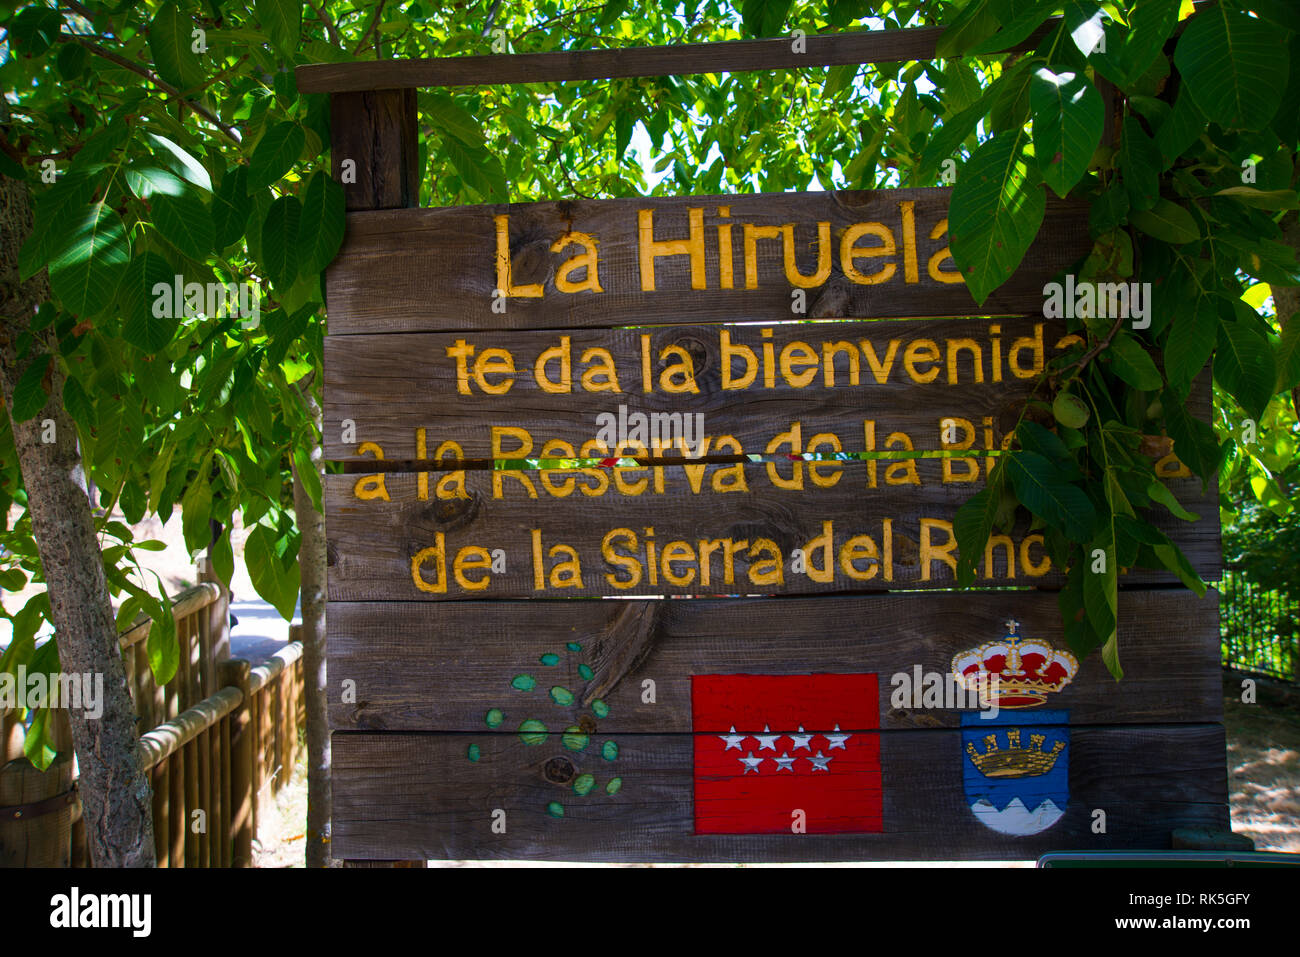 Welcoming sign. La Hiruela, Madrid province, Spain. - Stock Image